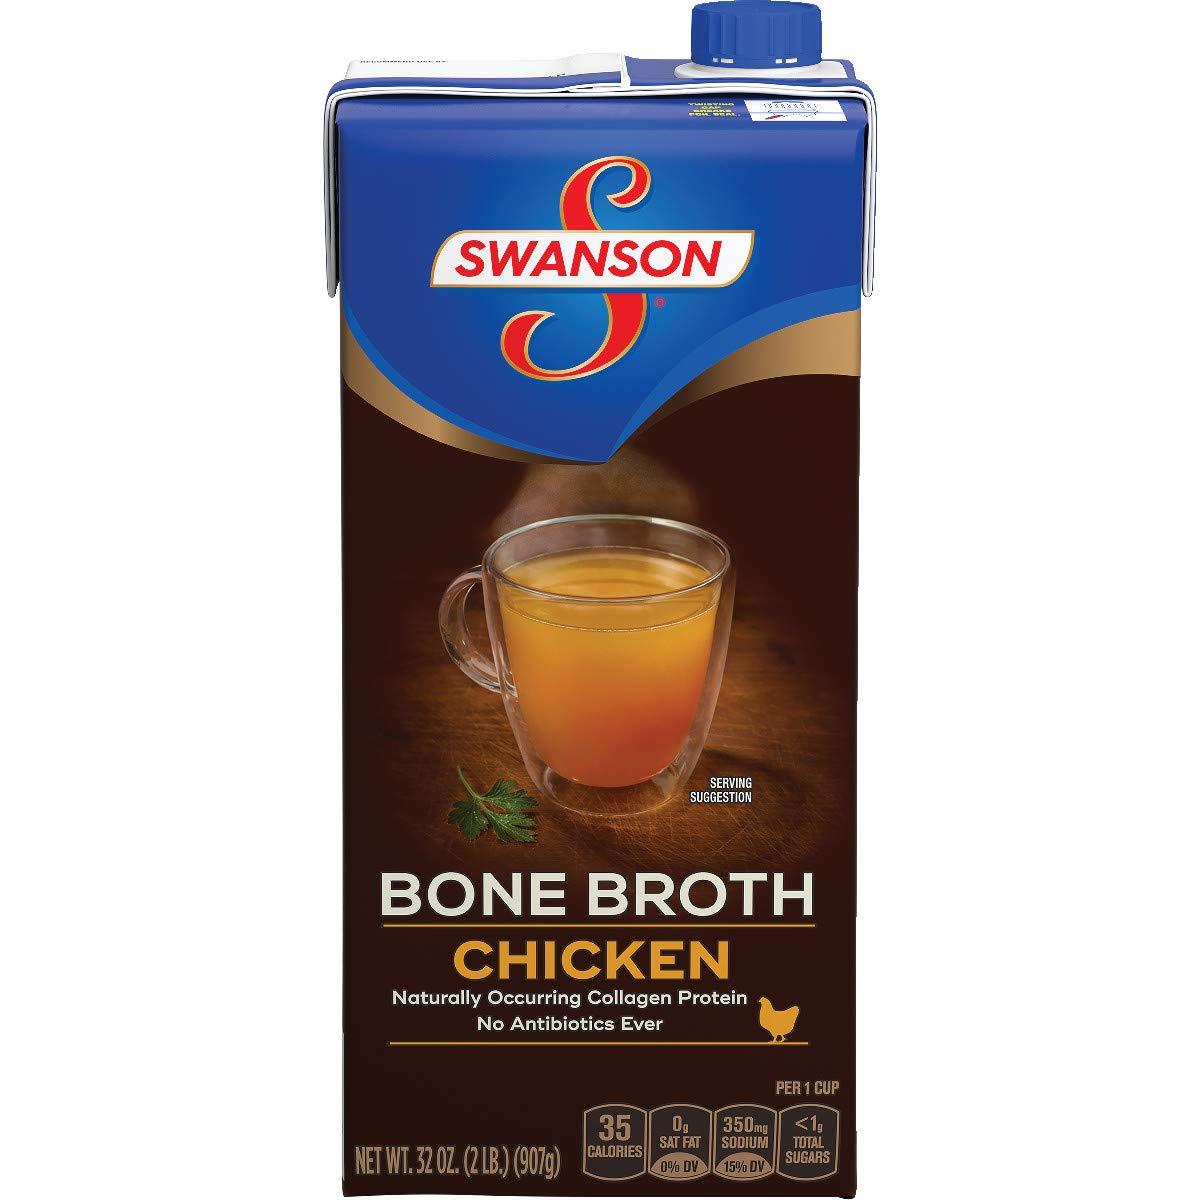 Swanson Chicken Bone Broth, 32 oz. Carton